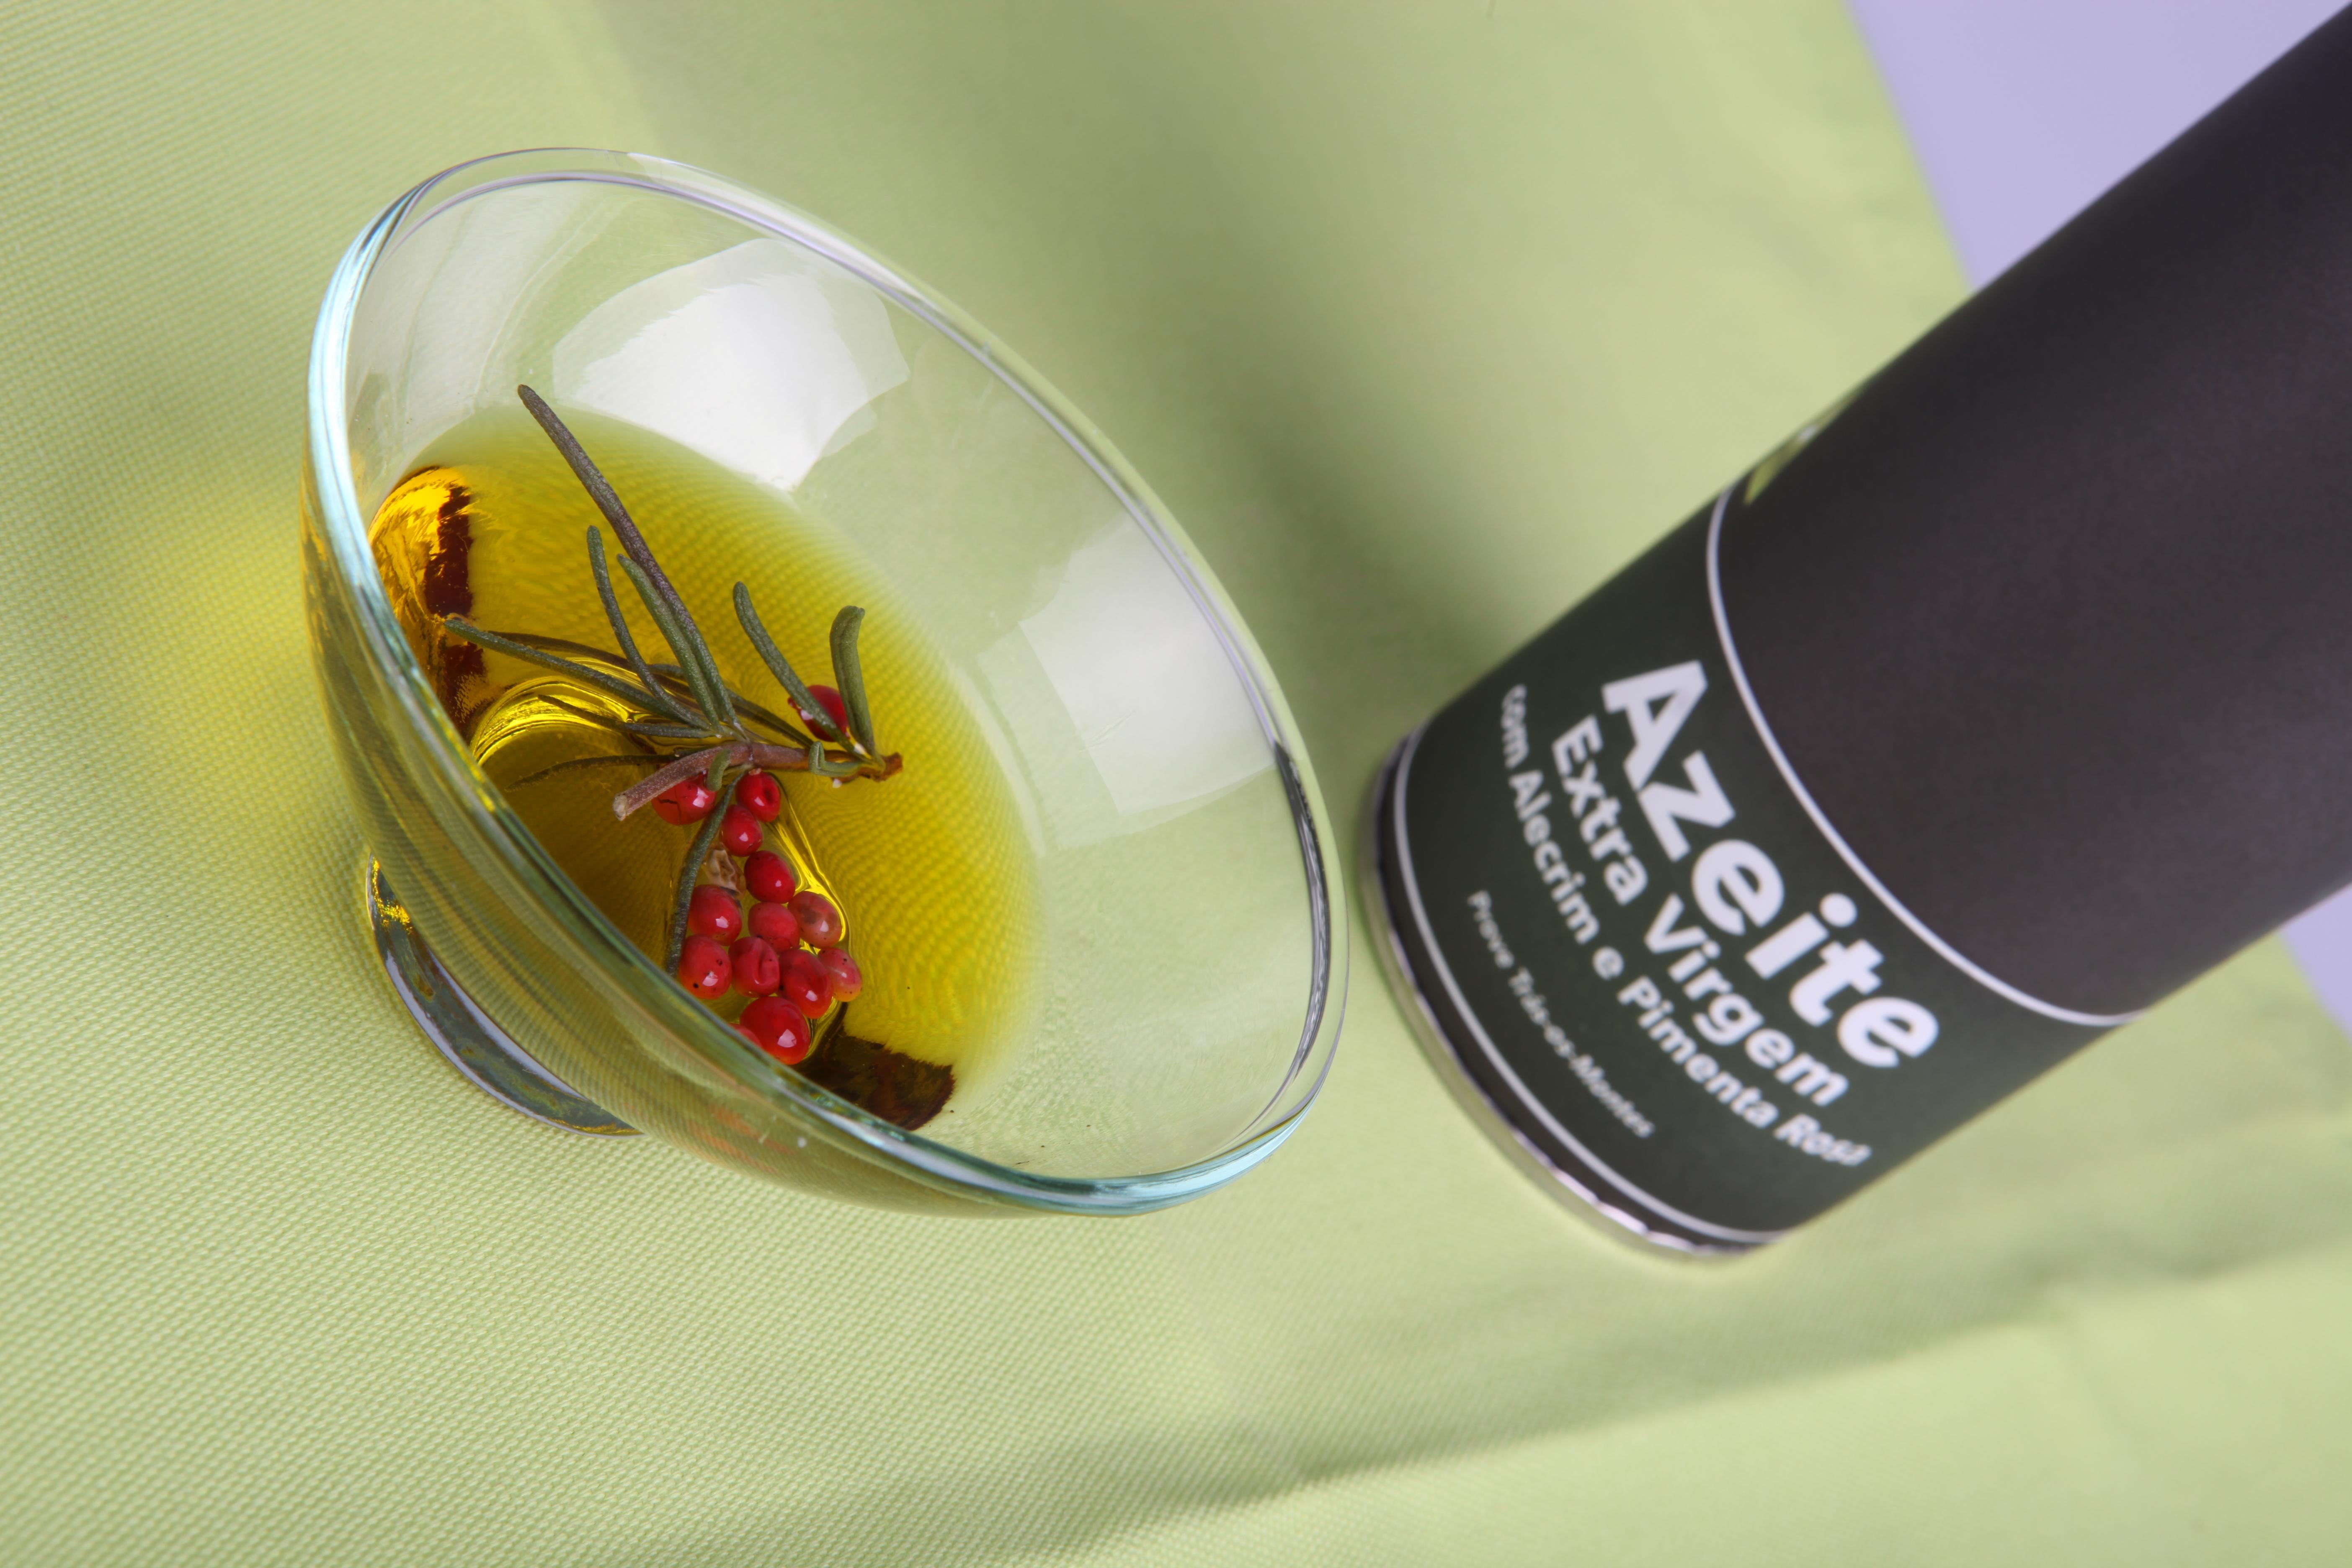 Ana olive oil